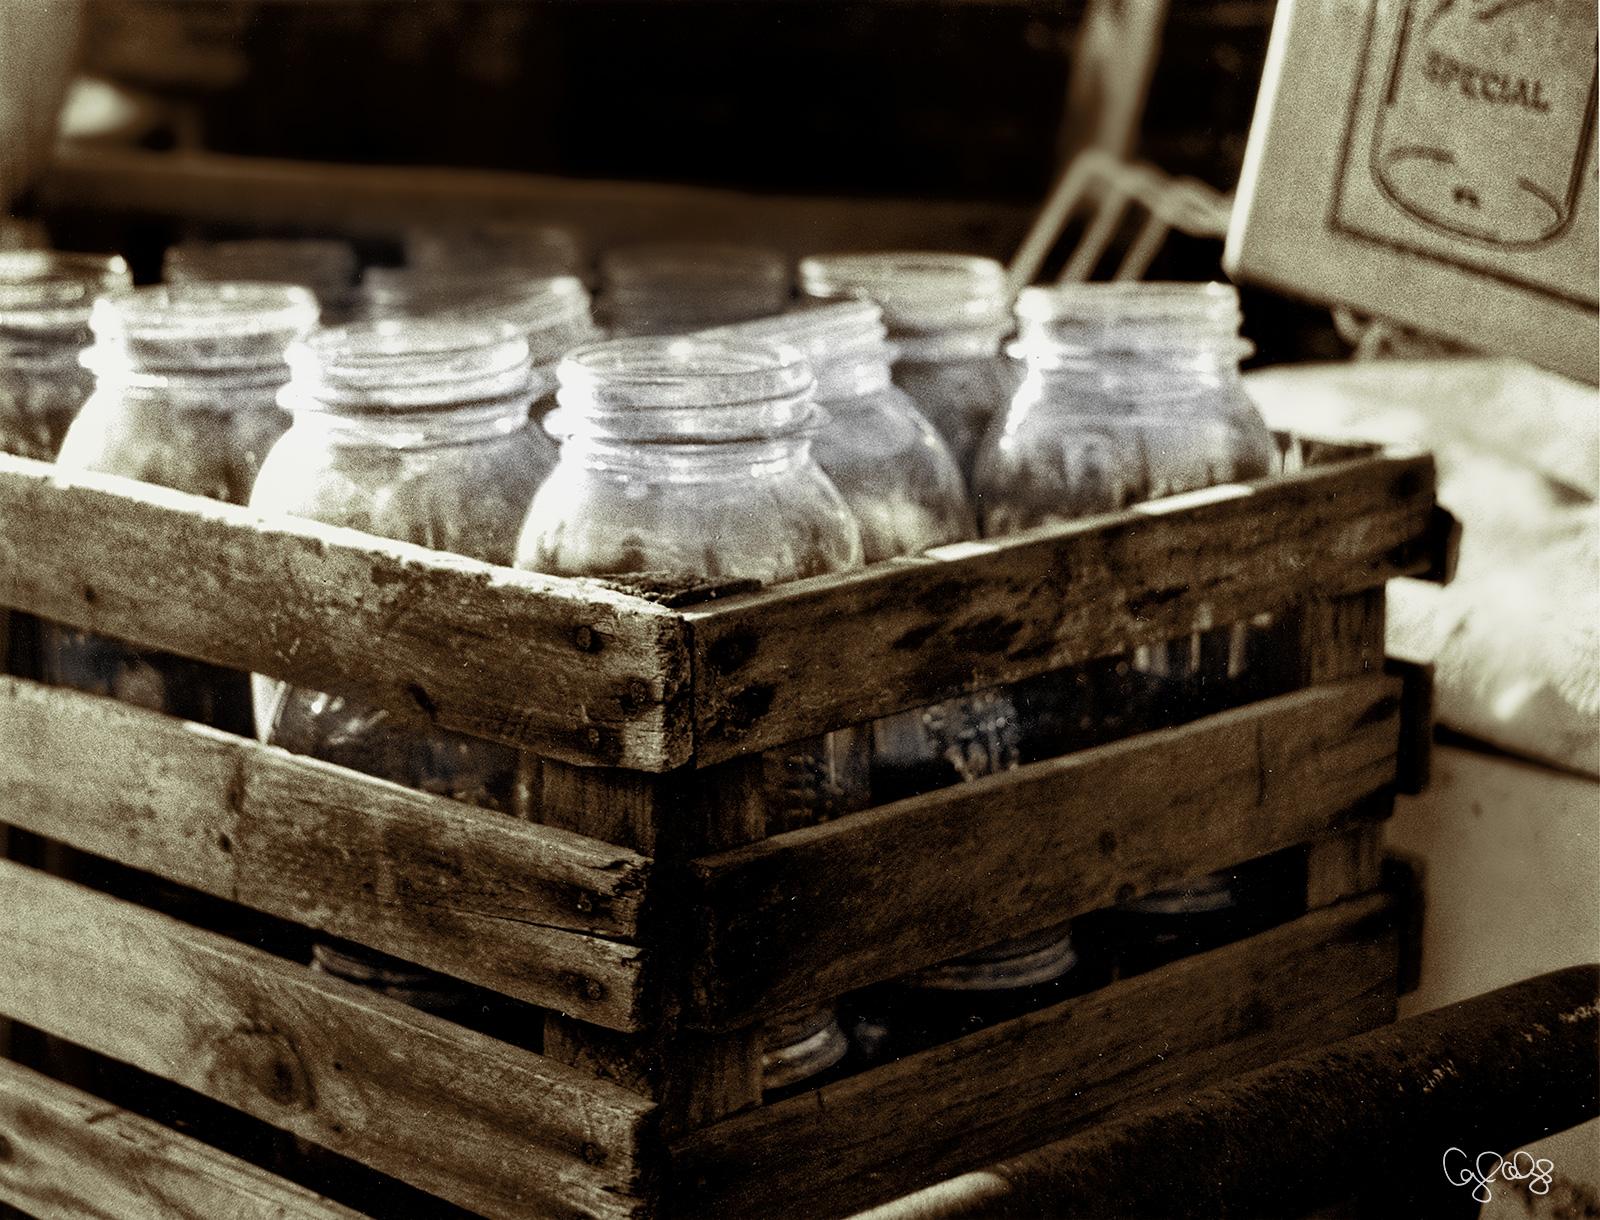 1091 Antique Bottles